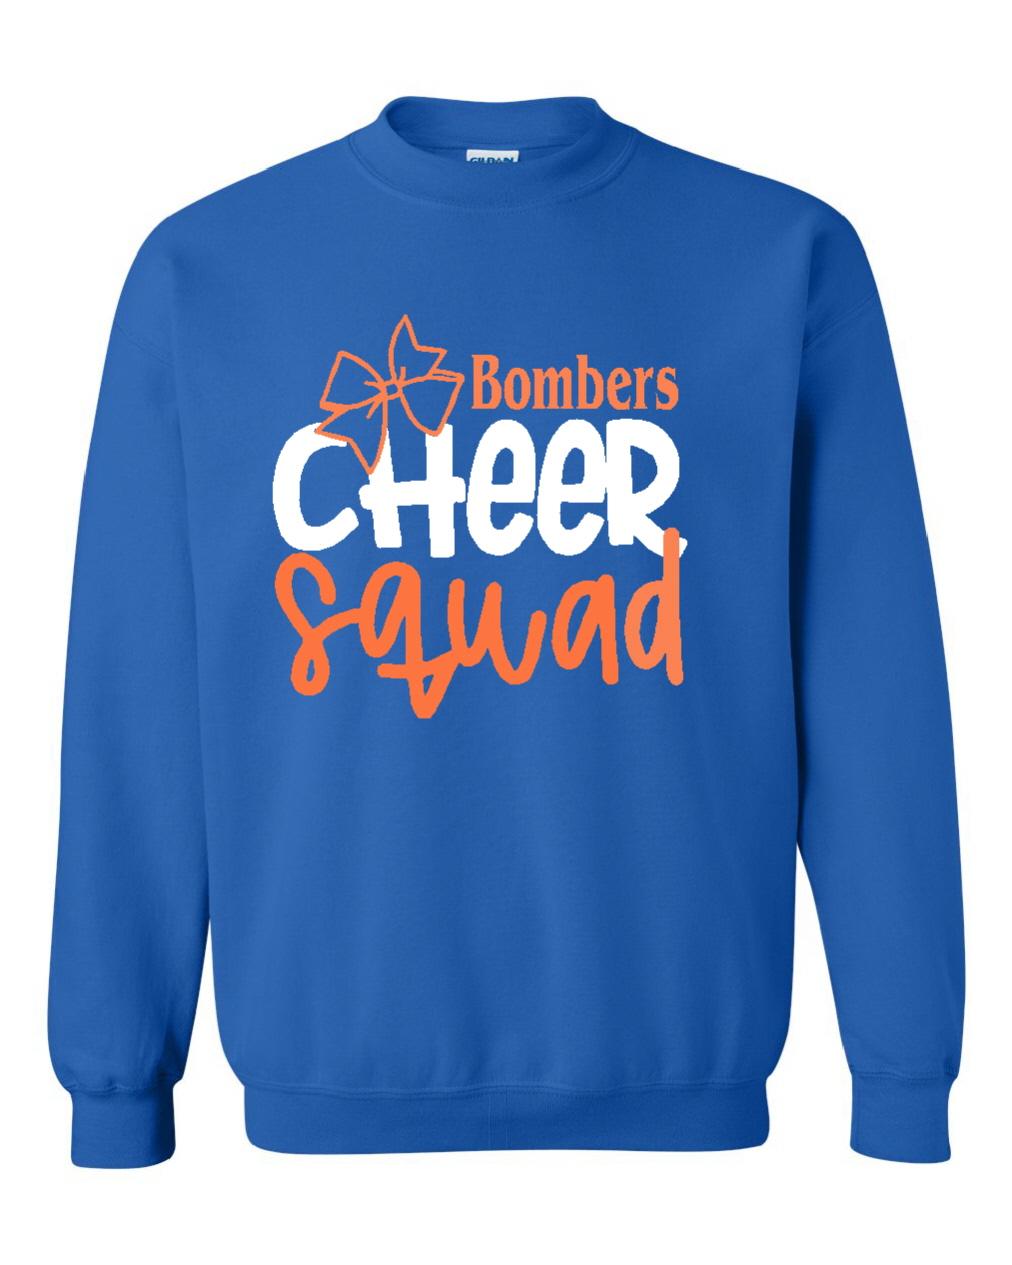 Cheer Squad Bombers